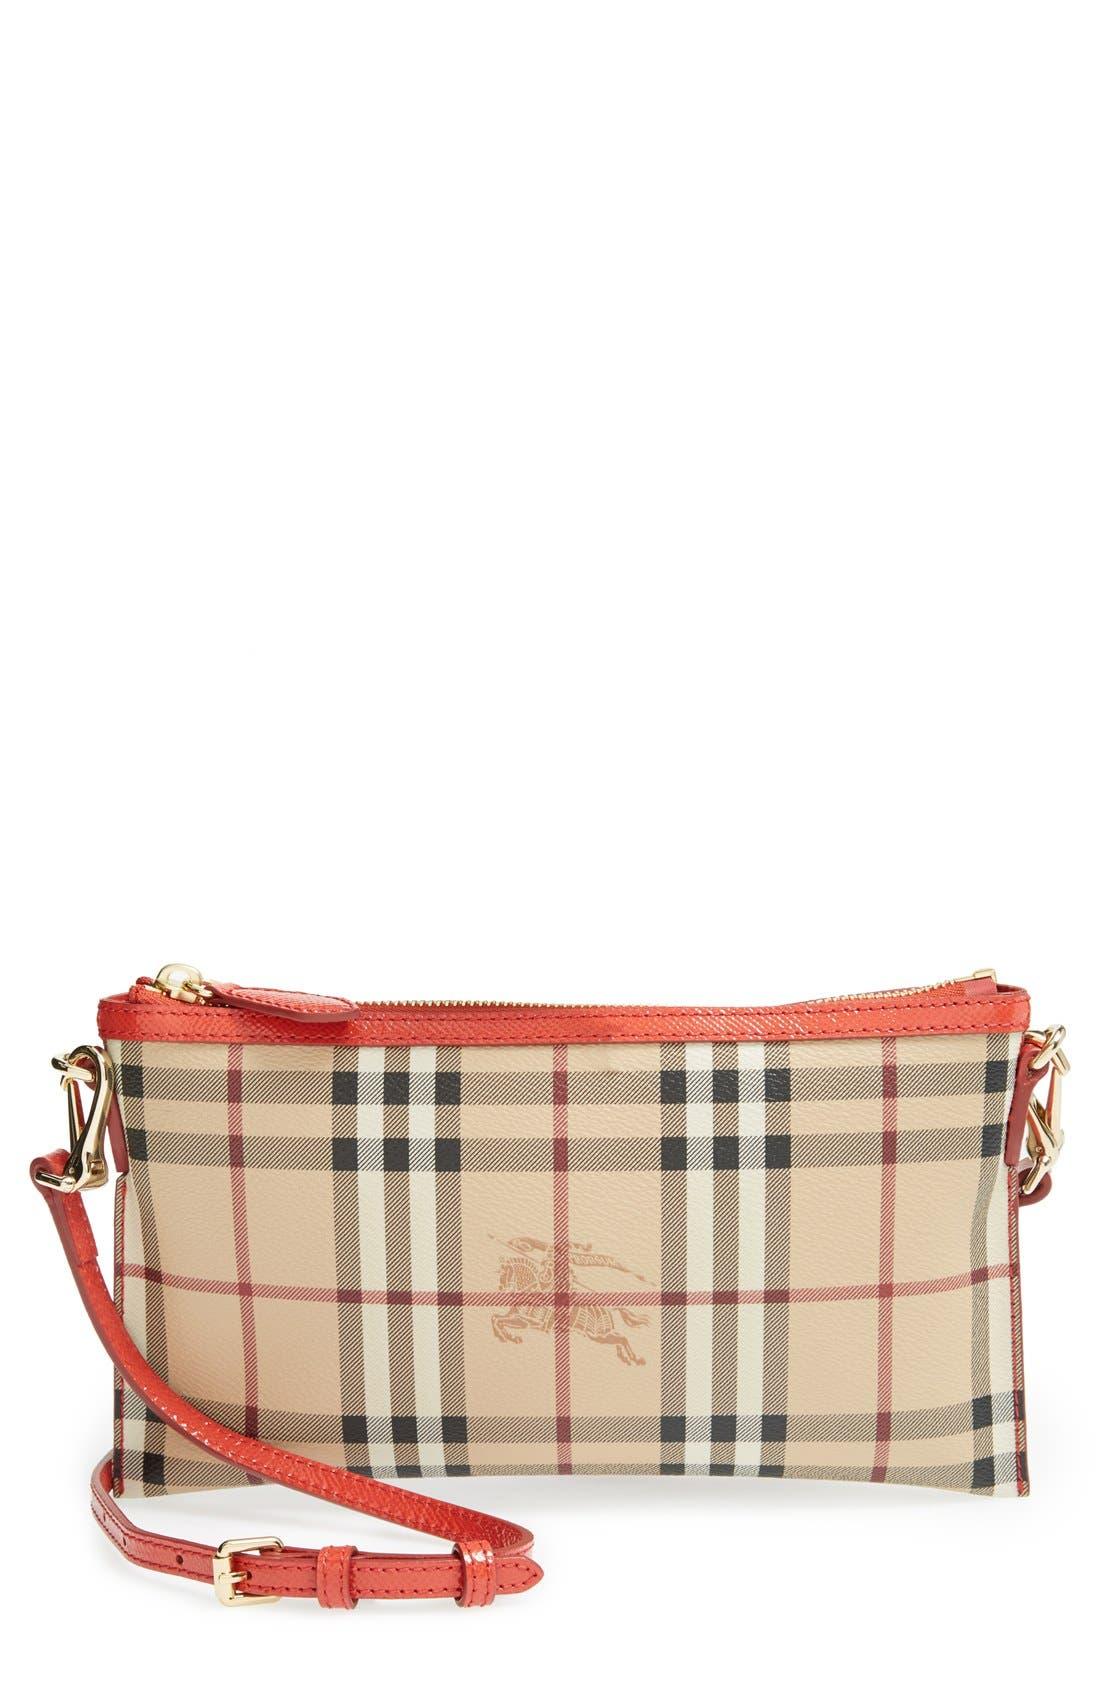 Main Image - Burberry 'Peyton - Haymarket Check' Crossbody Bag